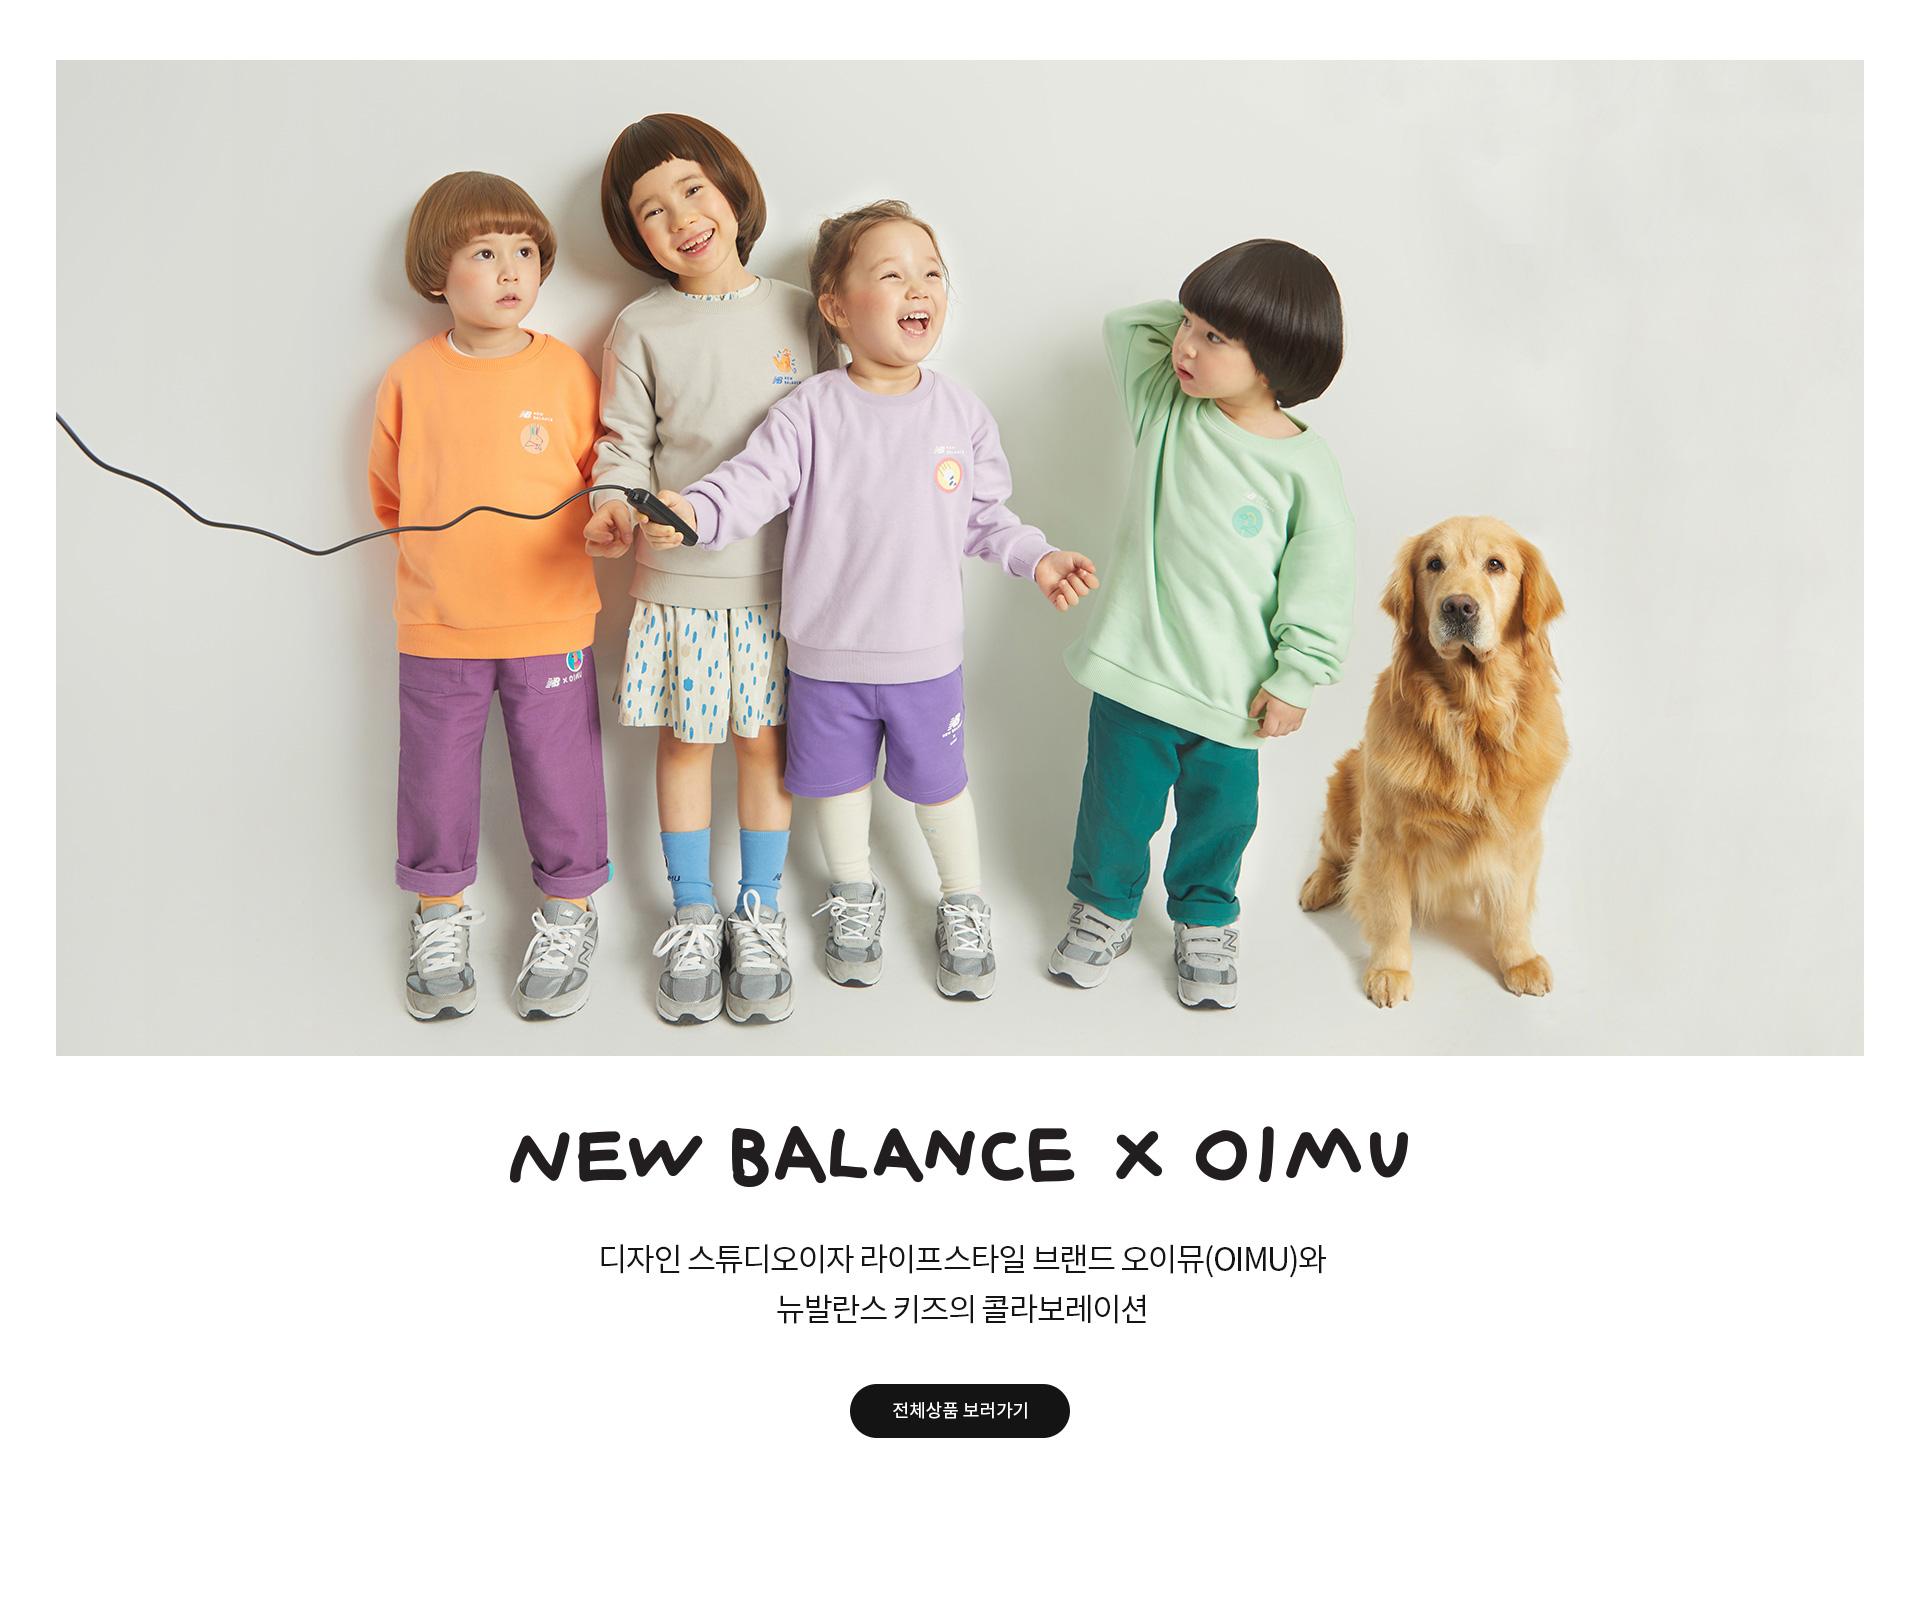 NEW BALANCE X OIMU